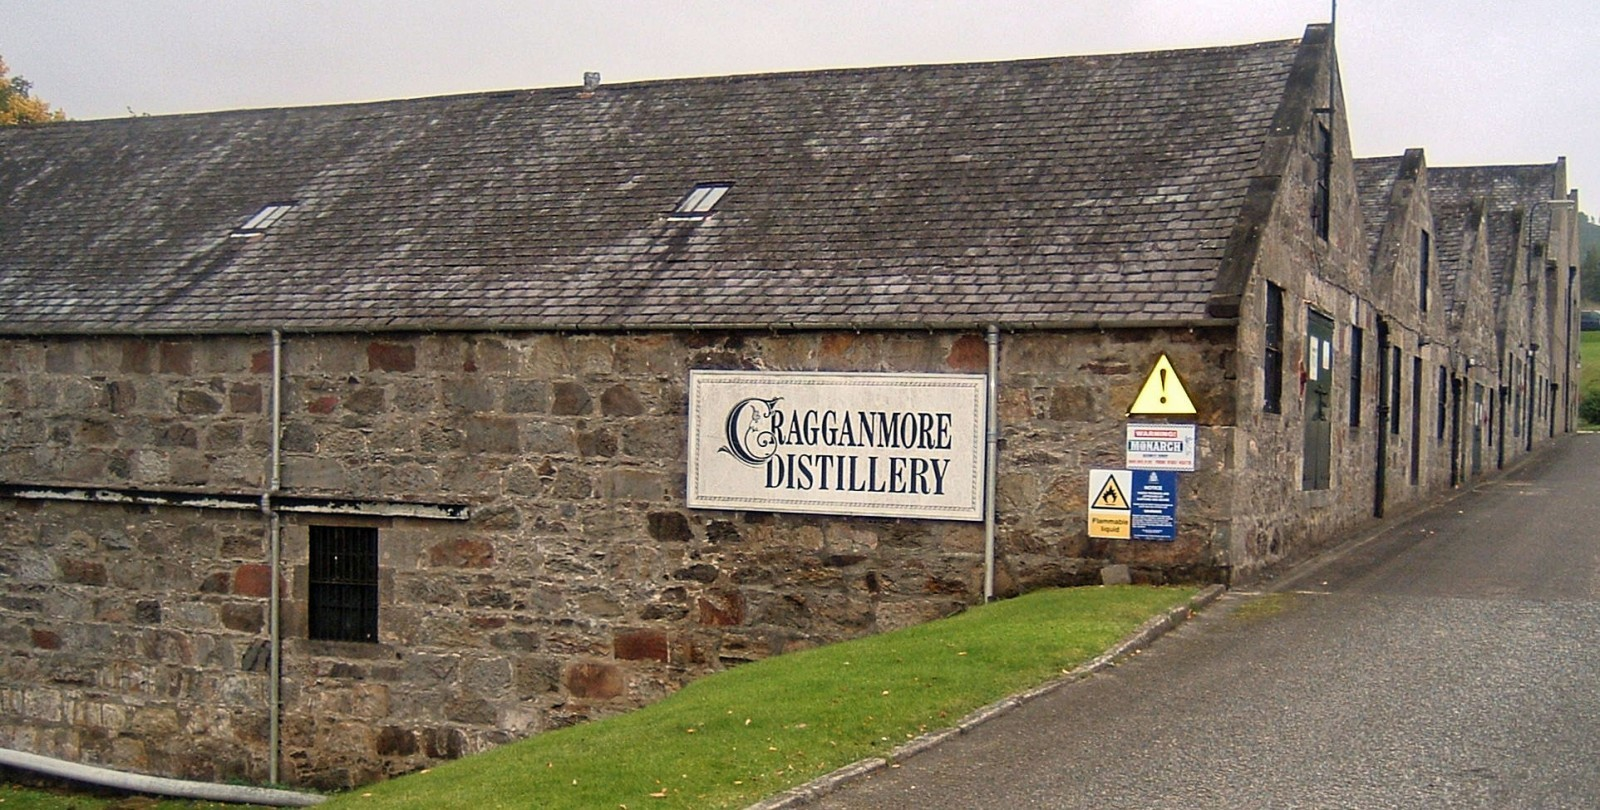 Cragganmore Anfahrt